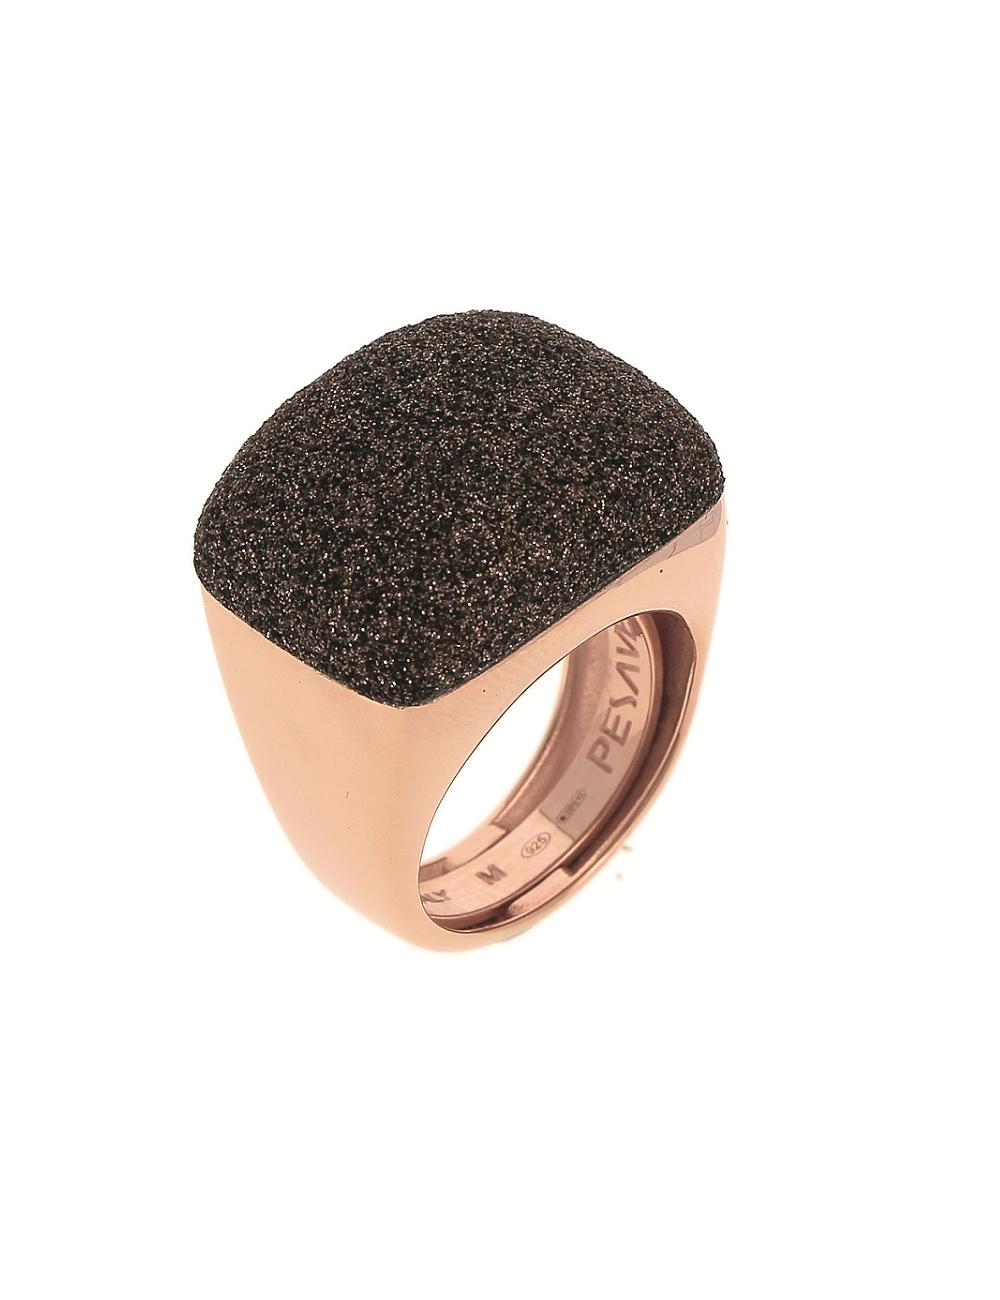 Pesavento -Anillo Pesavento rosa polvo marrón -WPLVA1695